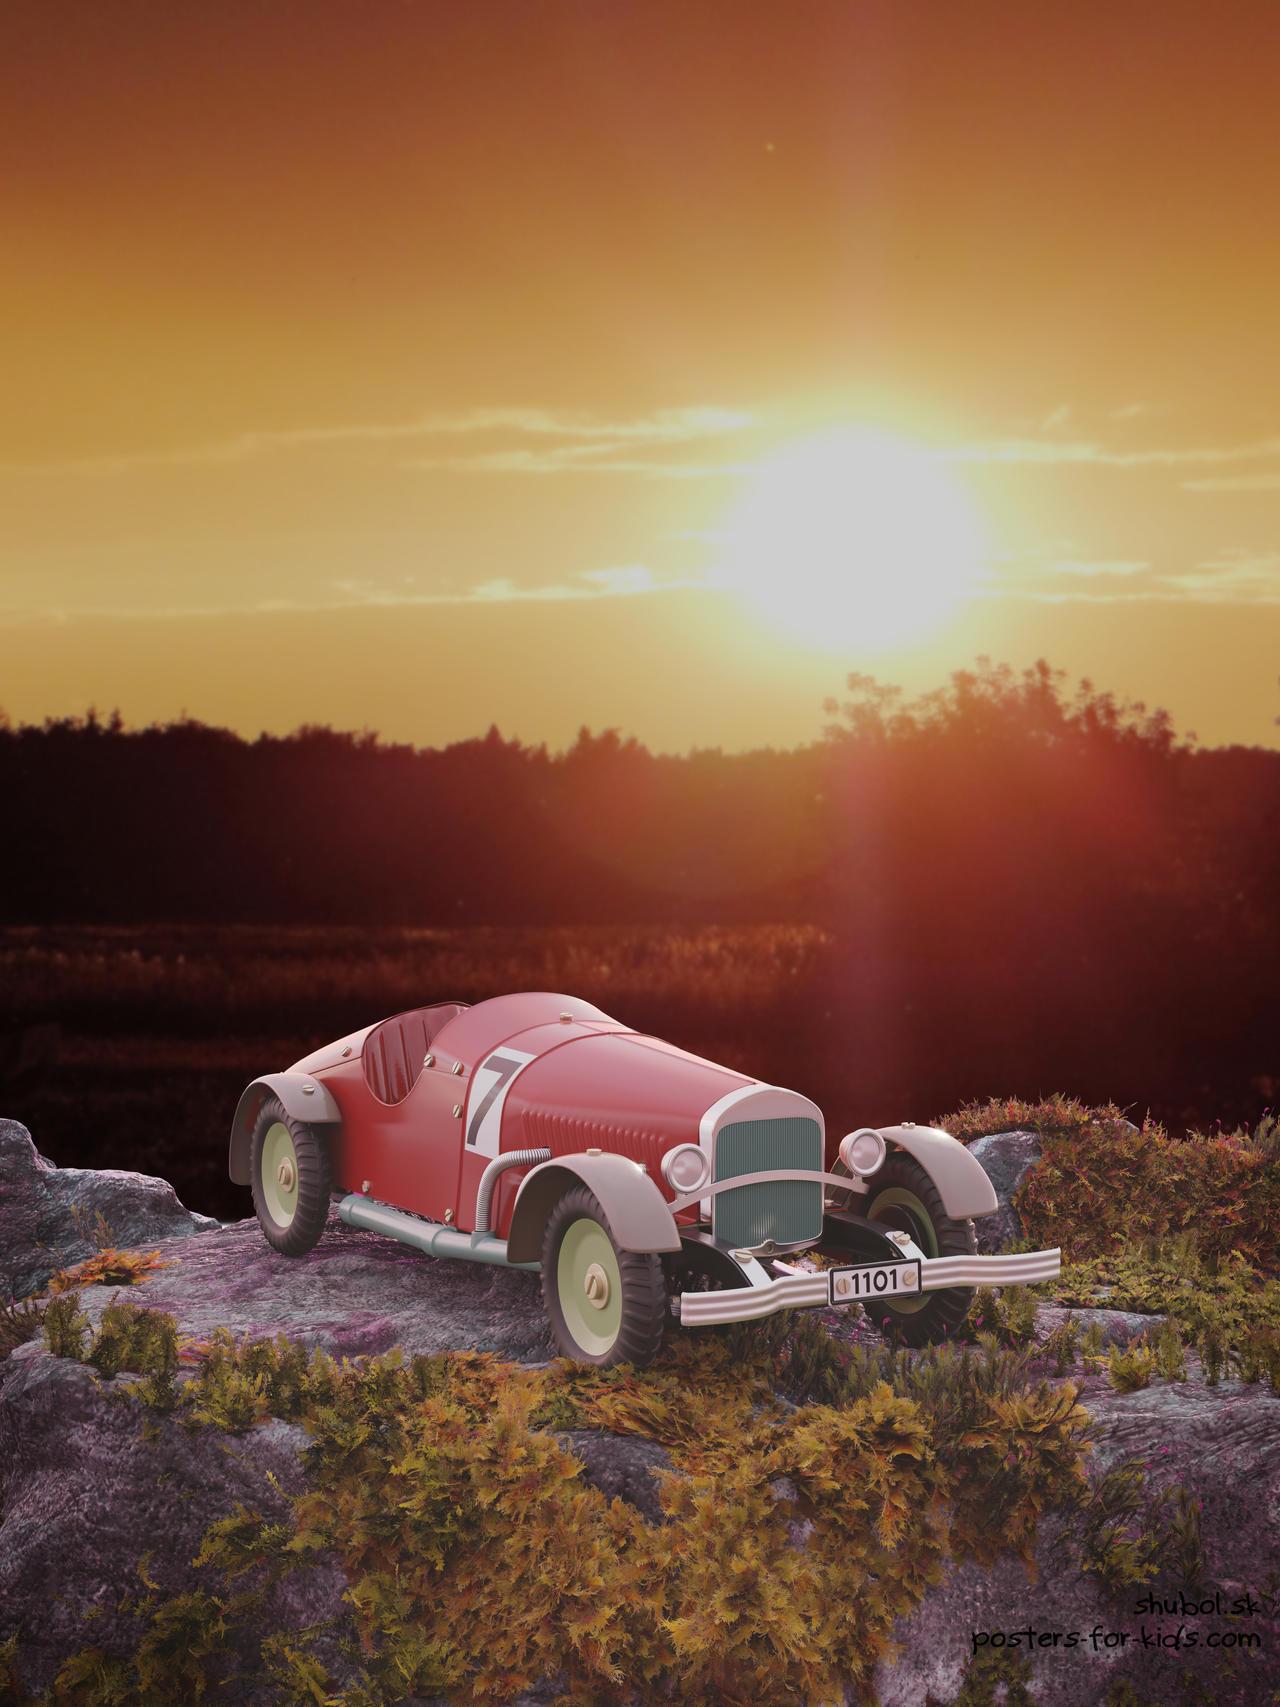 Mercedes-Benz - Vintage car toy